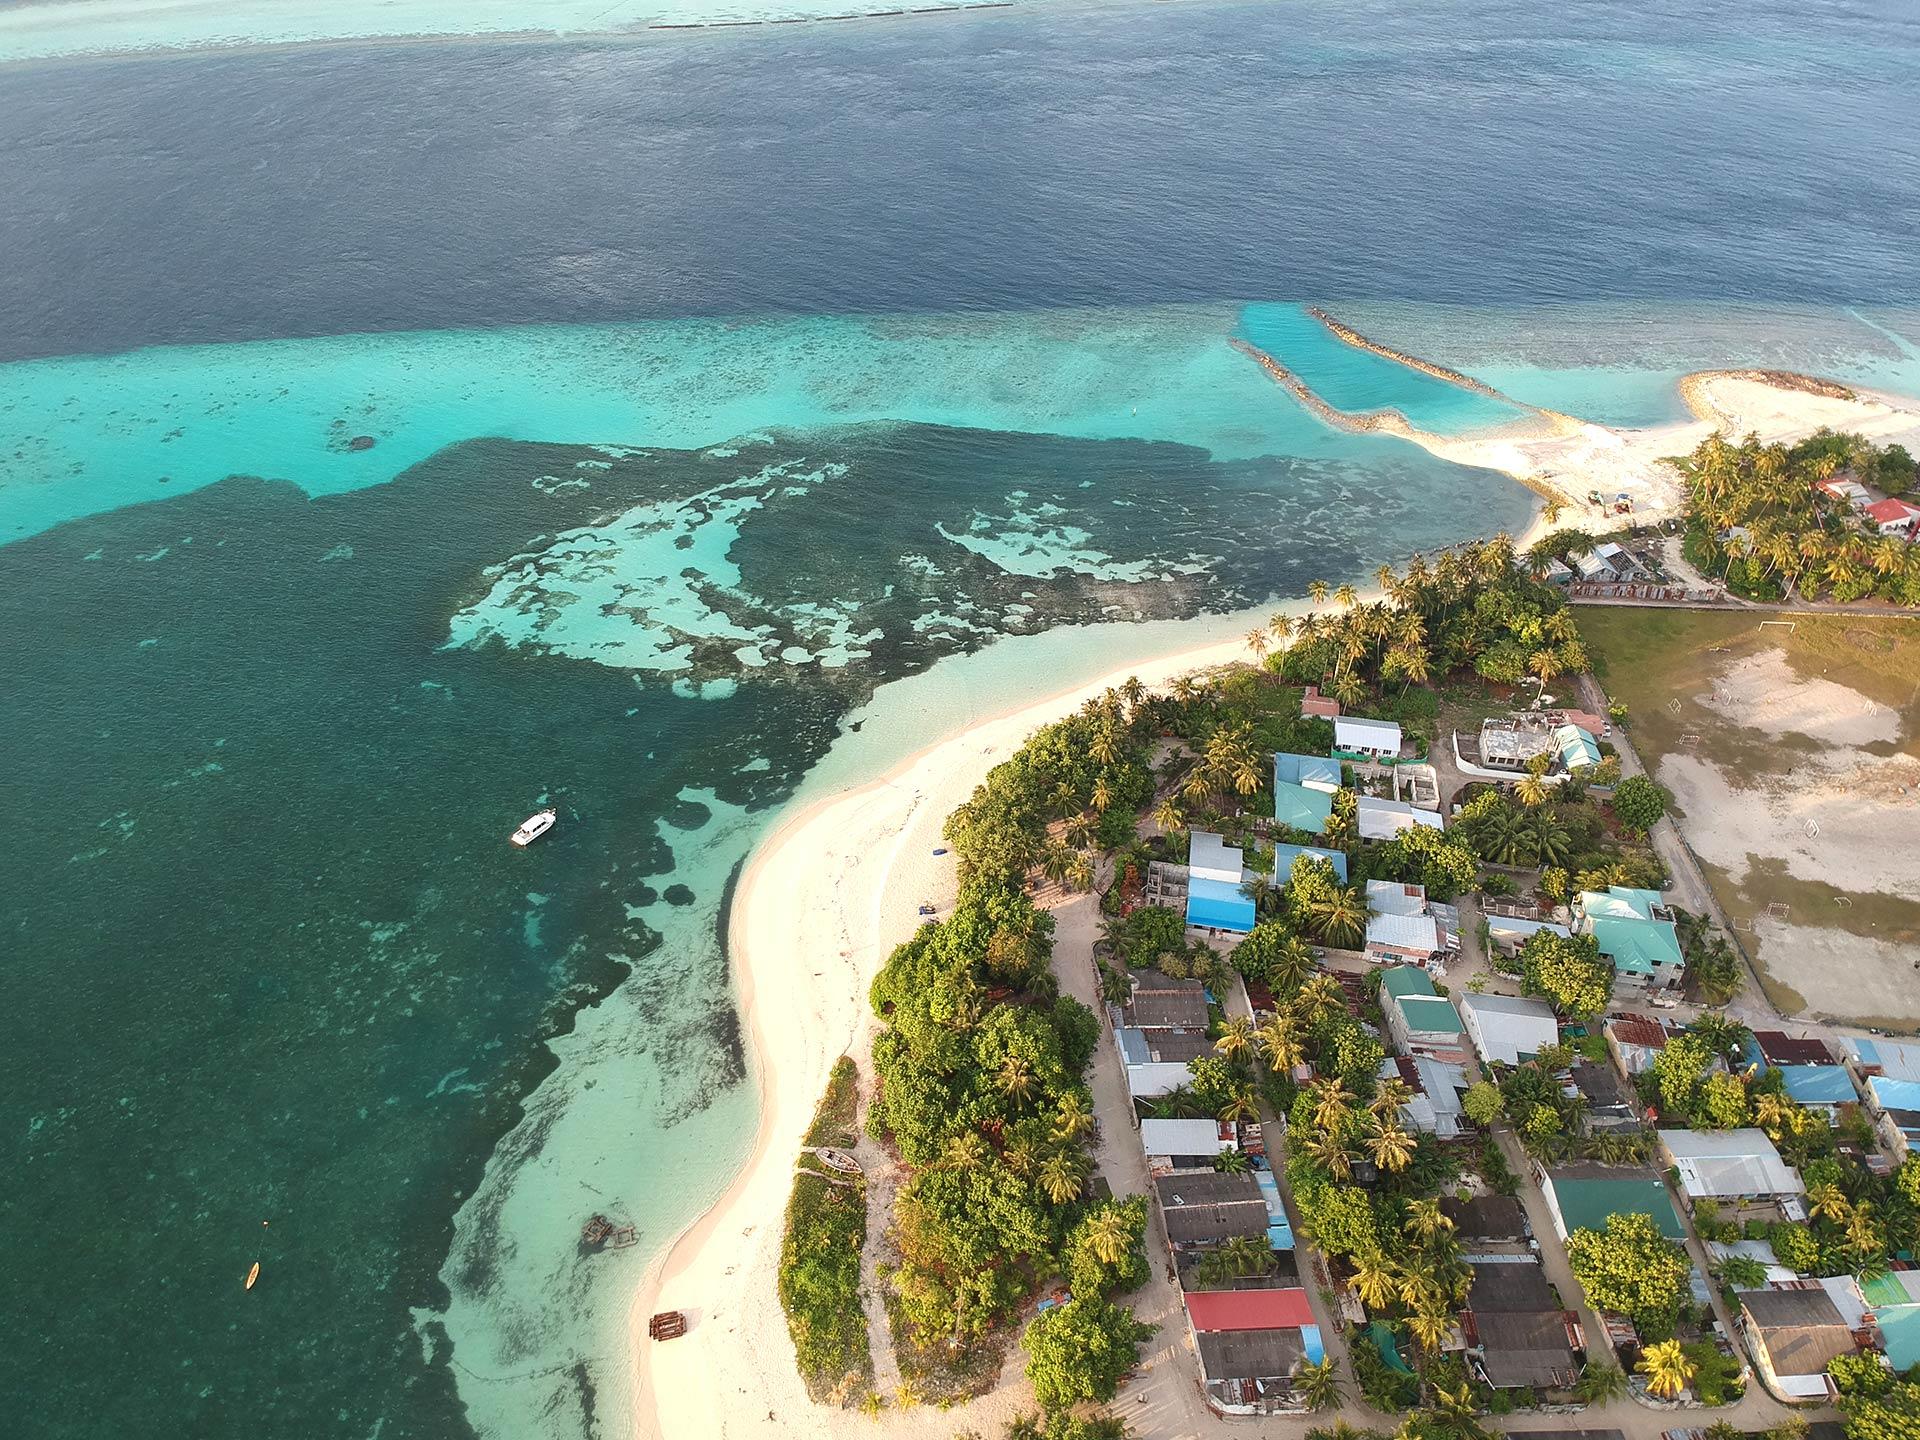 Fotos das Maldivas